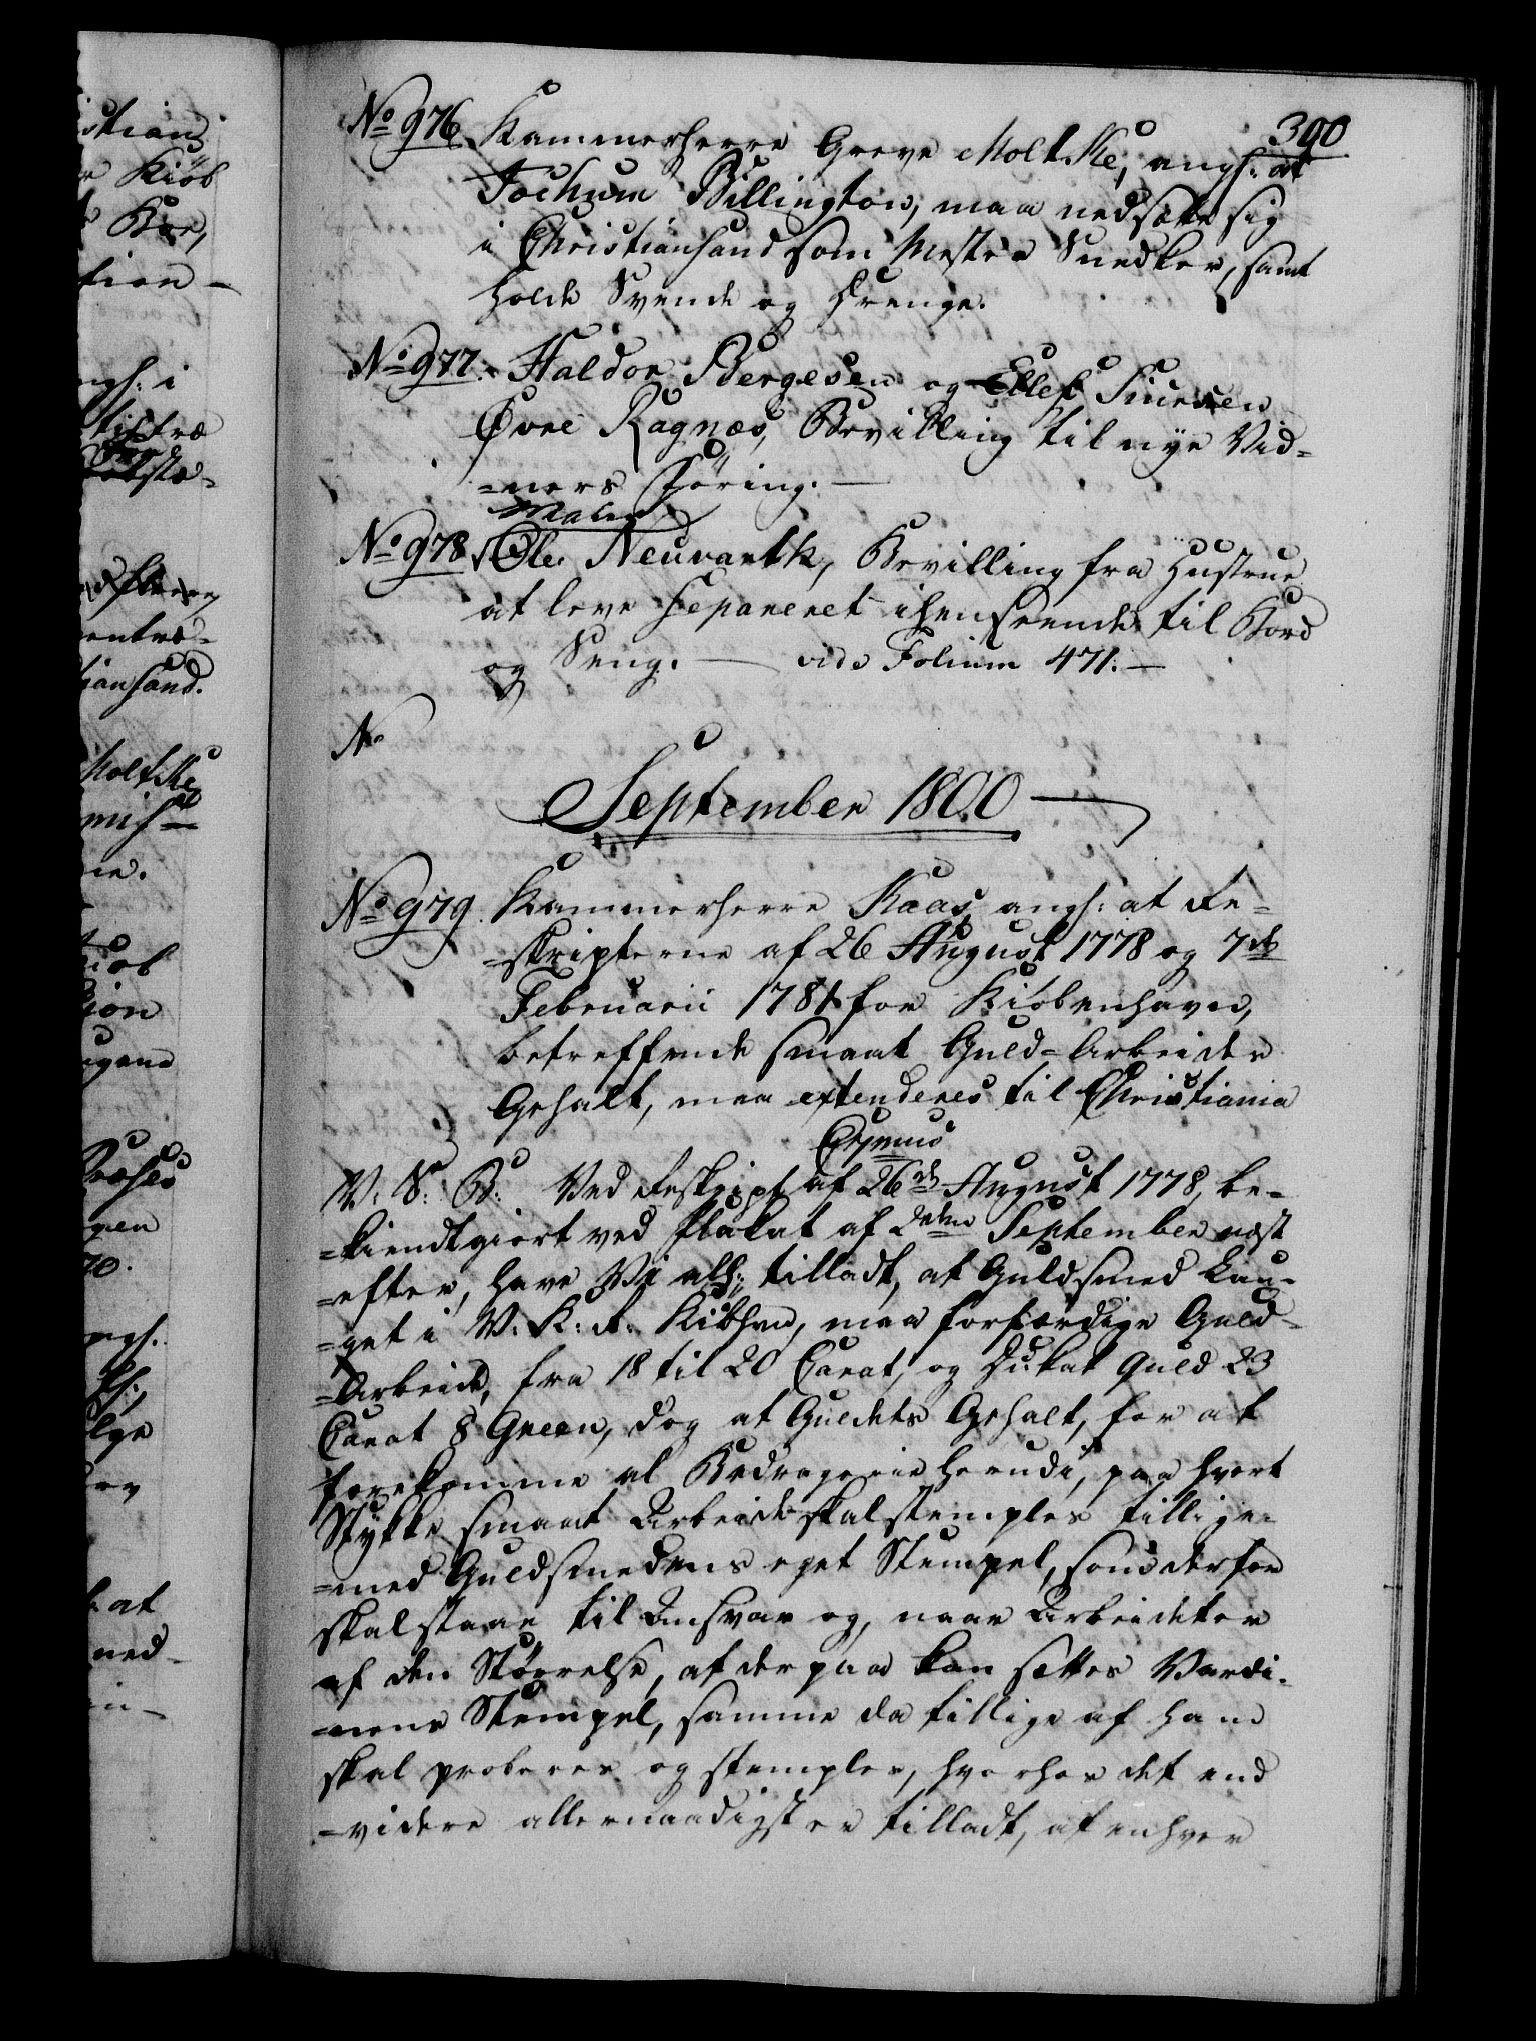 RA, Danske Kanselli 1800-1814, H/Hf/Hfb/Hfba/L0001: Registranter, 1800-1801, s. 300a